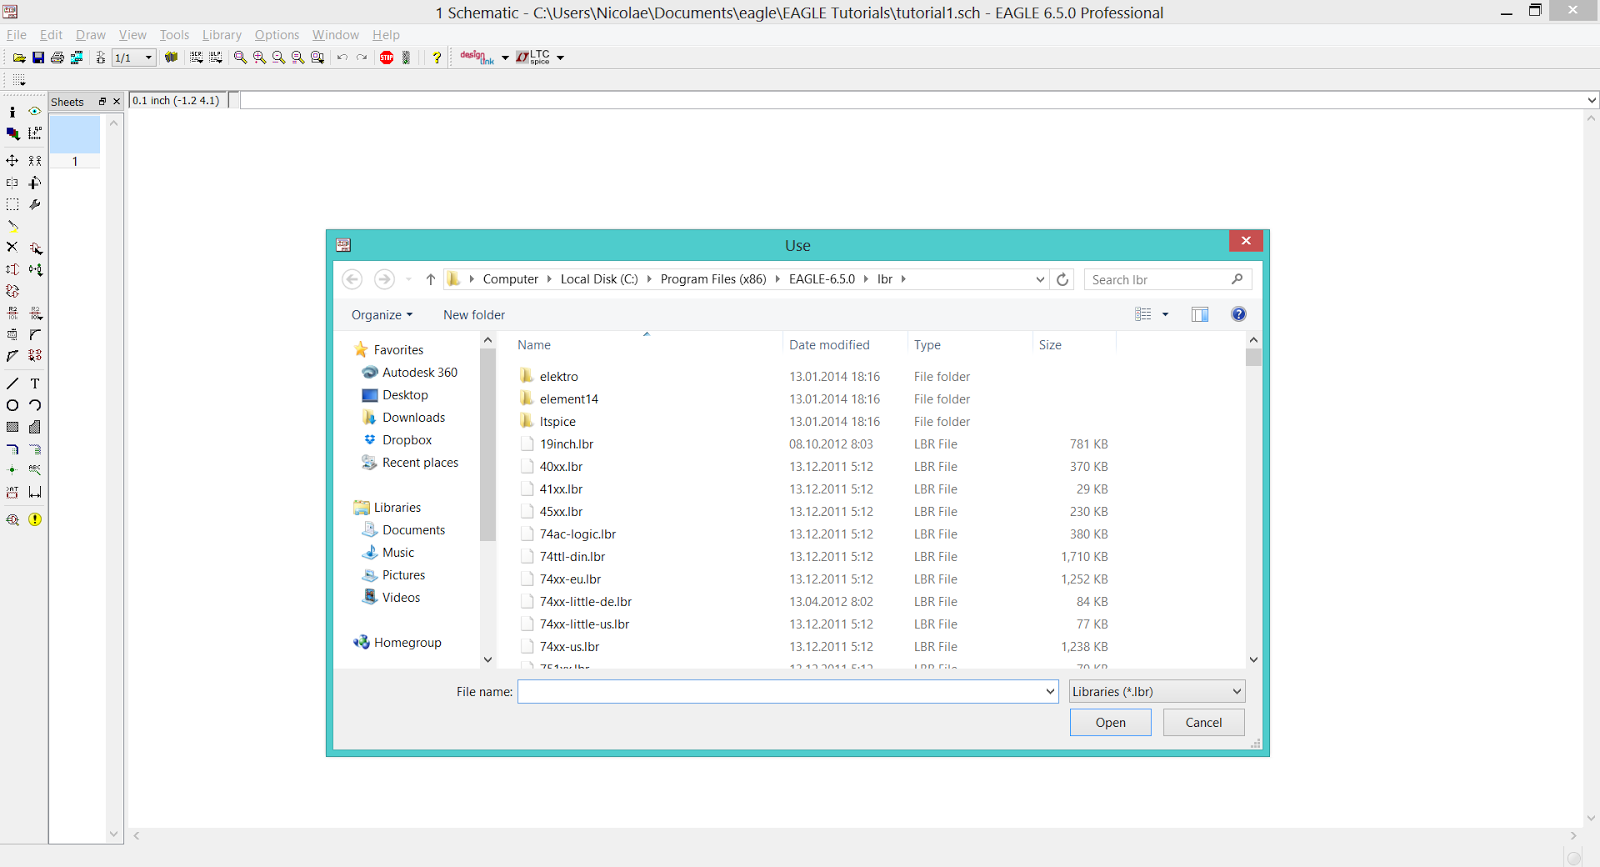 teknoow: EAGLE CAD - Libraries